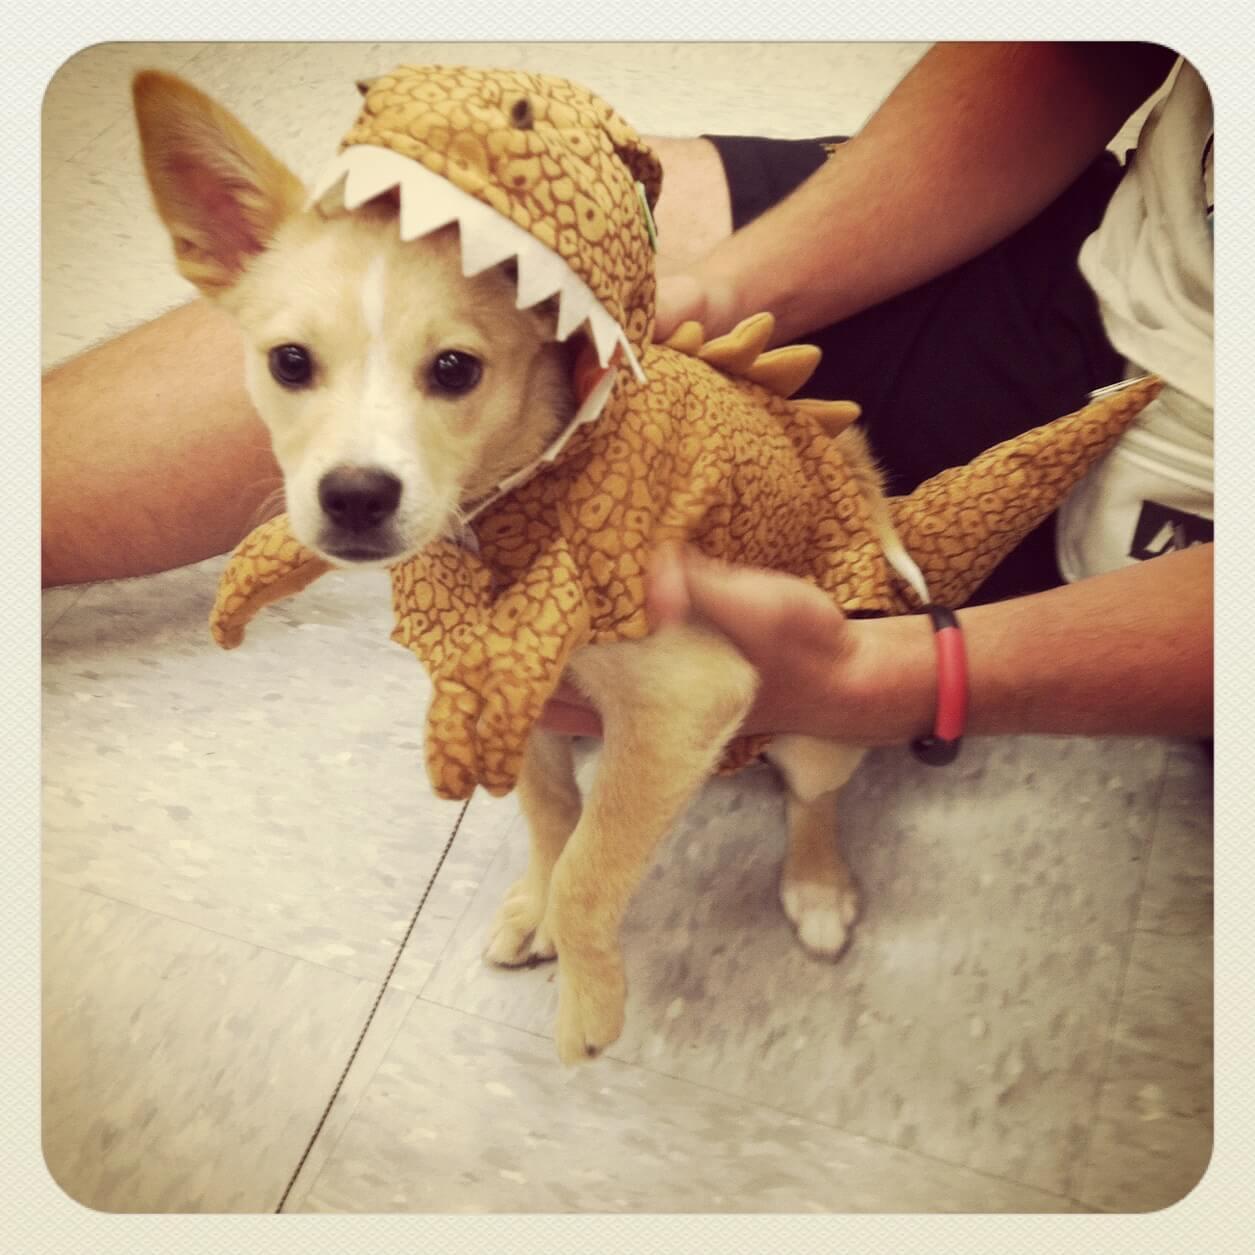 Jack the Dinosaur